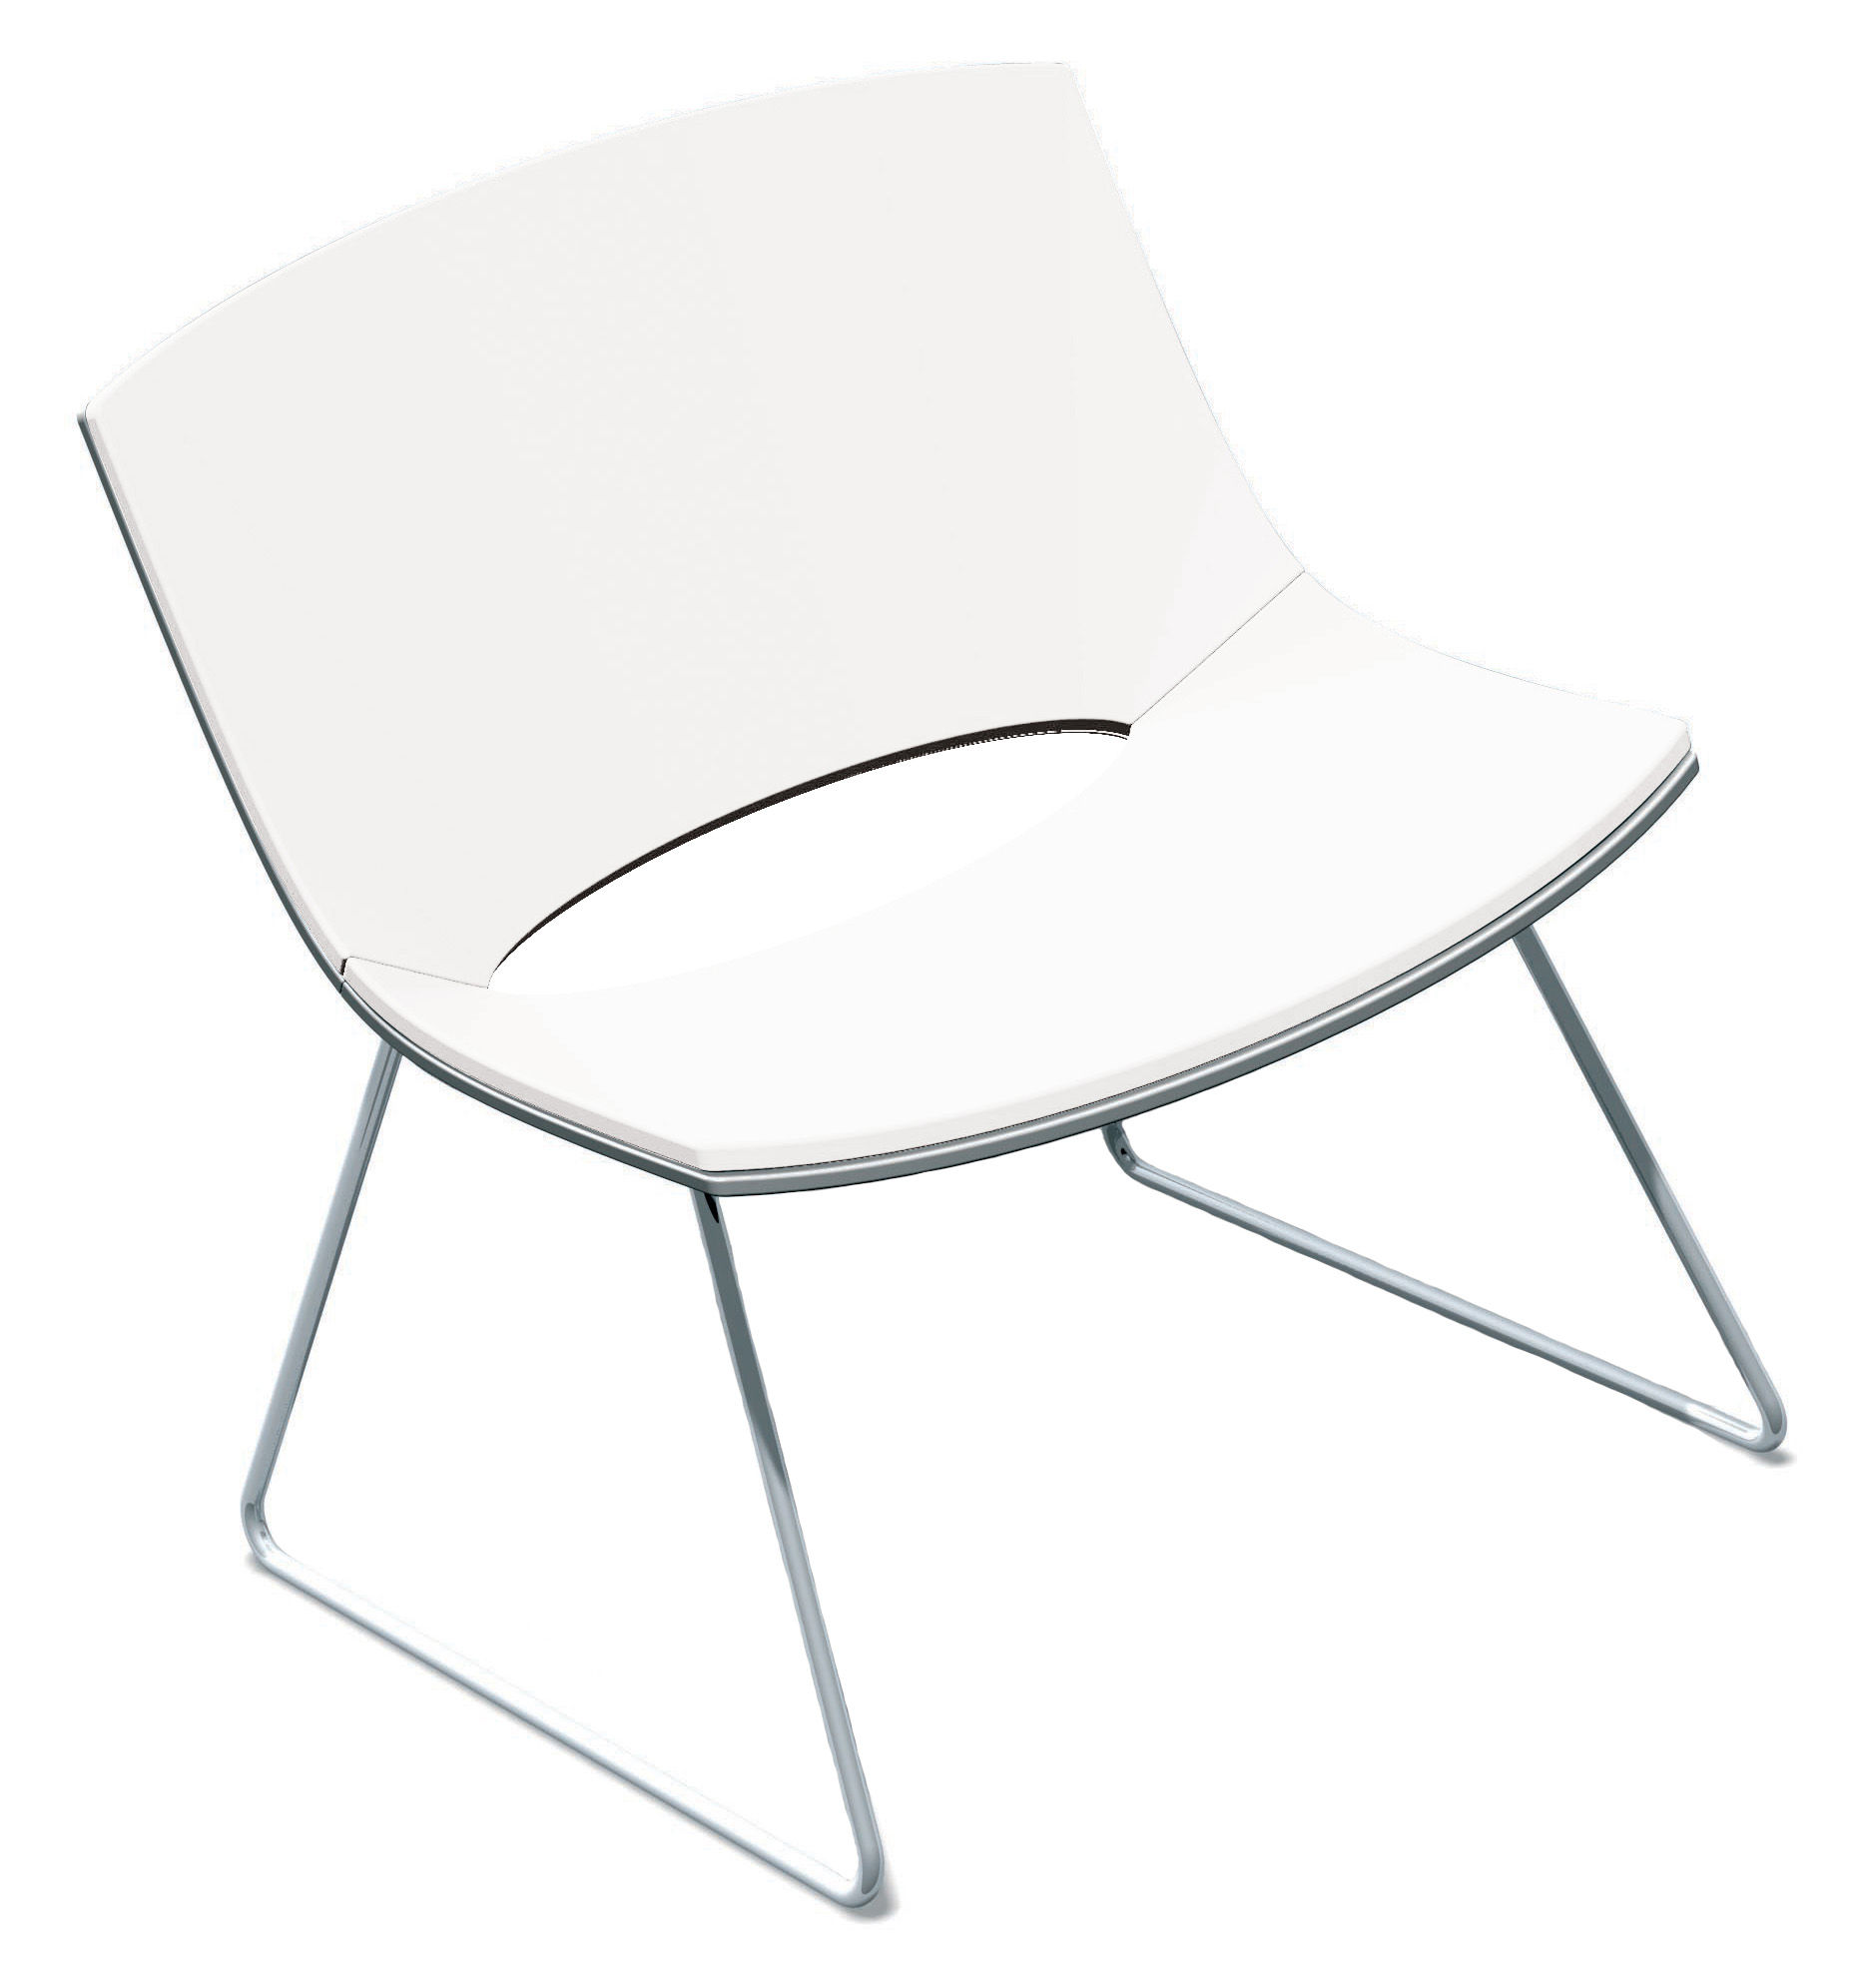 Möbel - Lounge Sessel - Oh! Lounge Sessel Kufengestell - Enea - Weiß - lackierter Stahl, Polypropylen